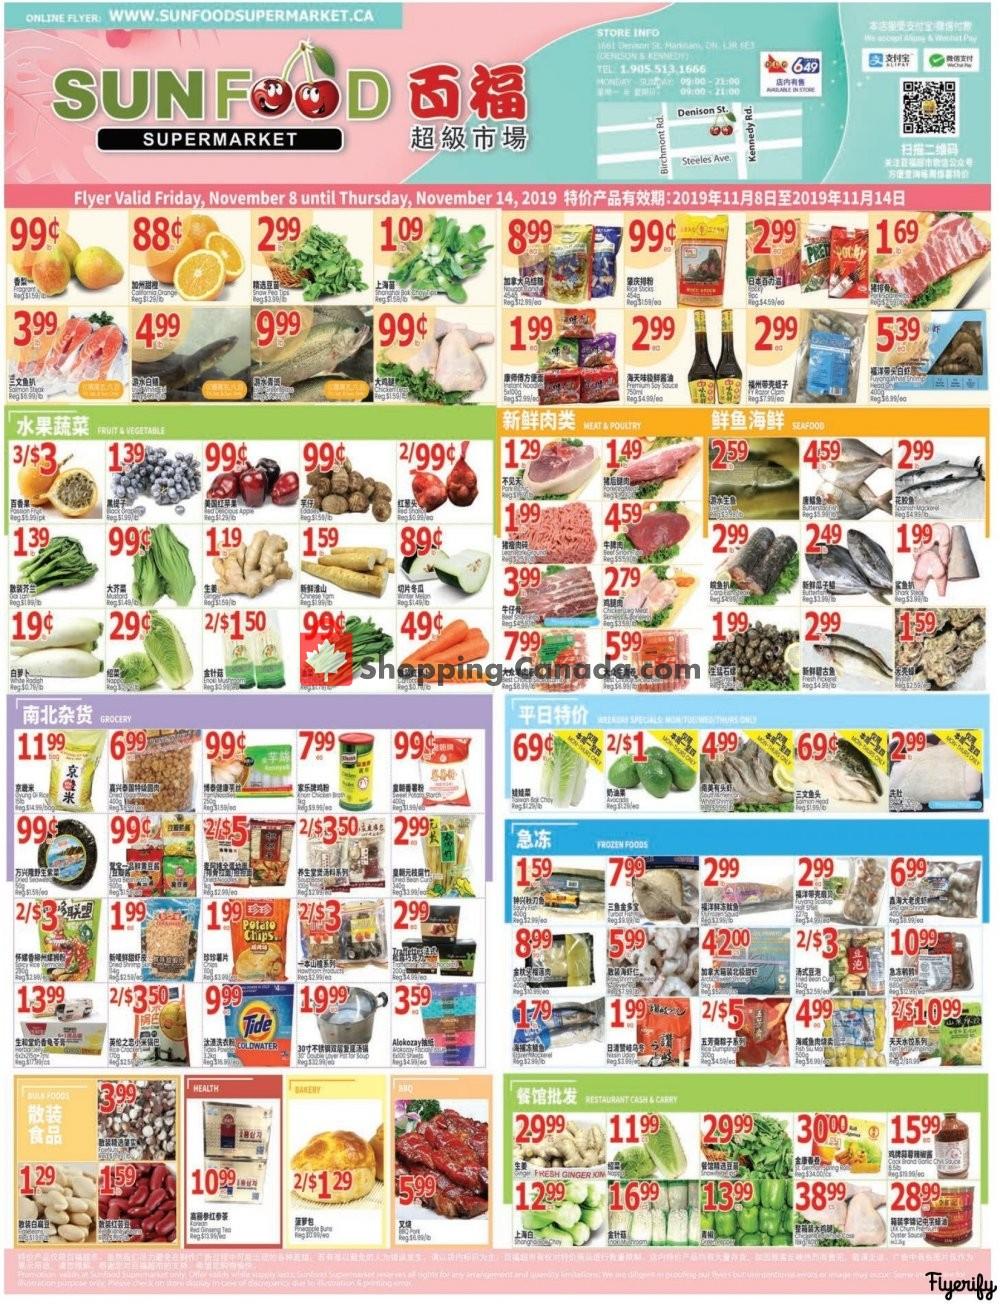 Flyer Sunfood Supermarket Canada - from Friday November 8, 2019 to Thursday November 14, 2019